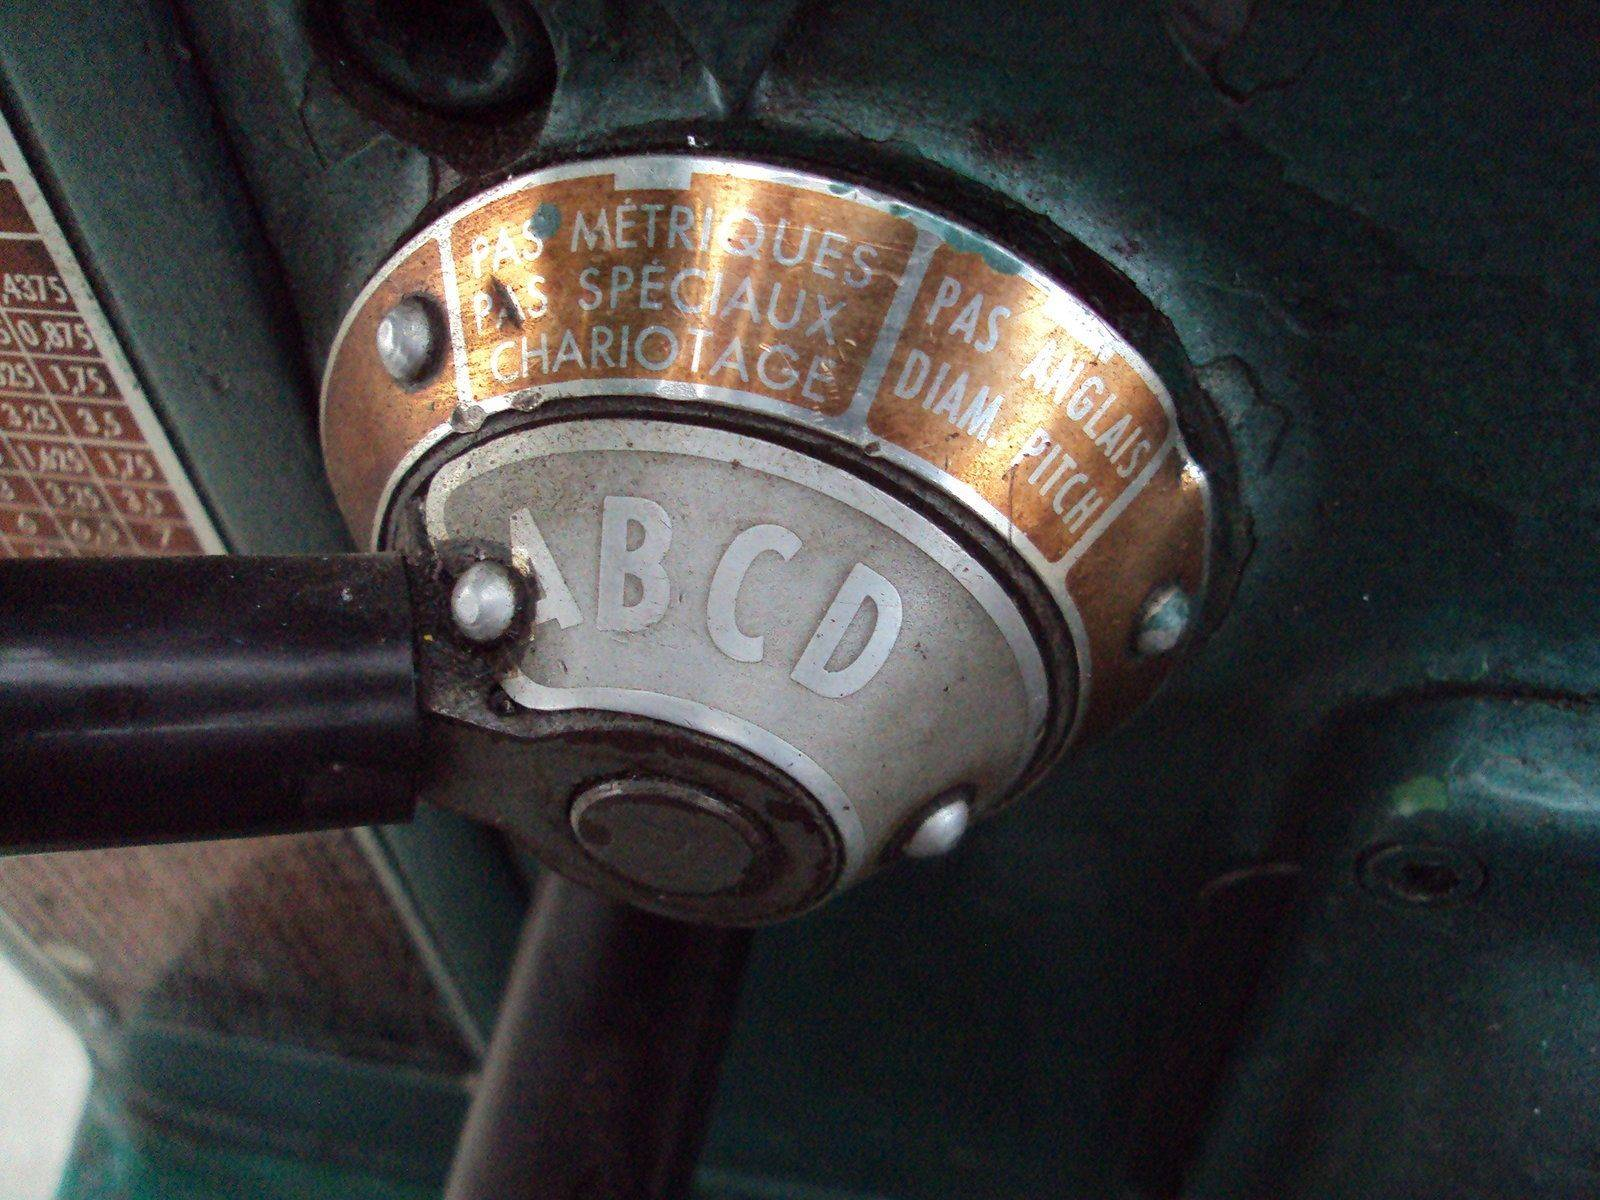 DSC05644.JPG